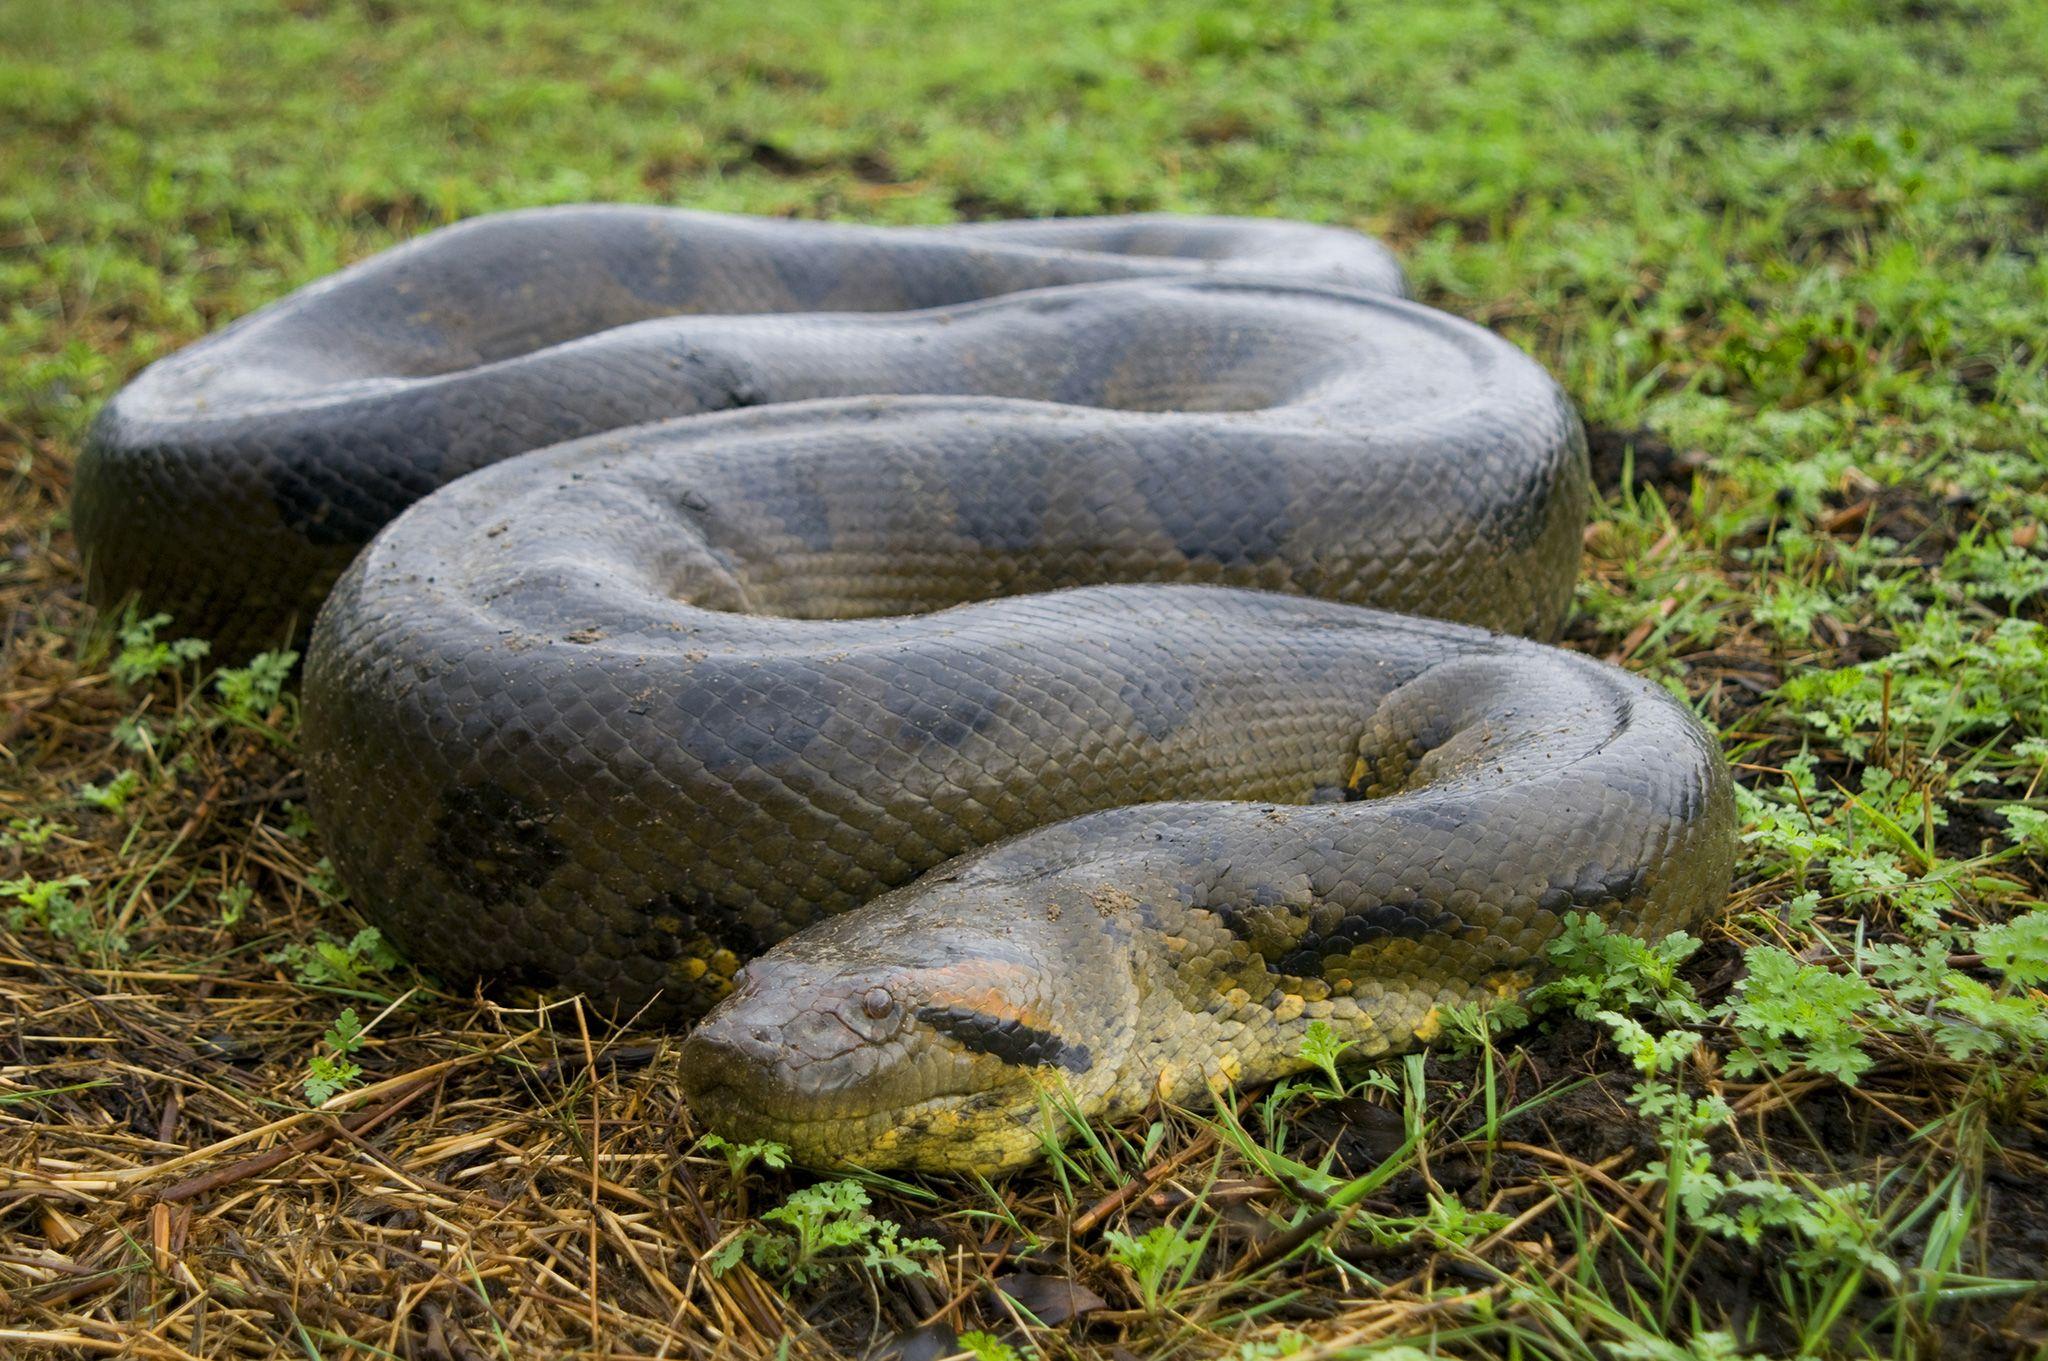 Green Anaconda With Images Anaconda Snake Green Anaconda Snake